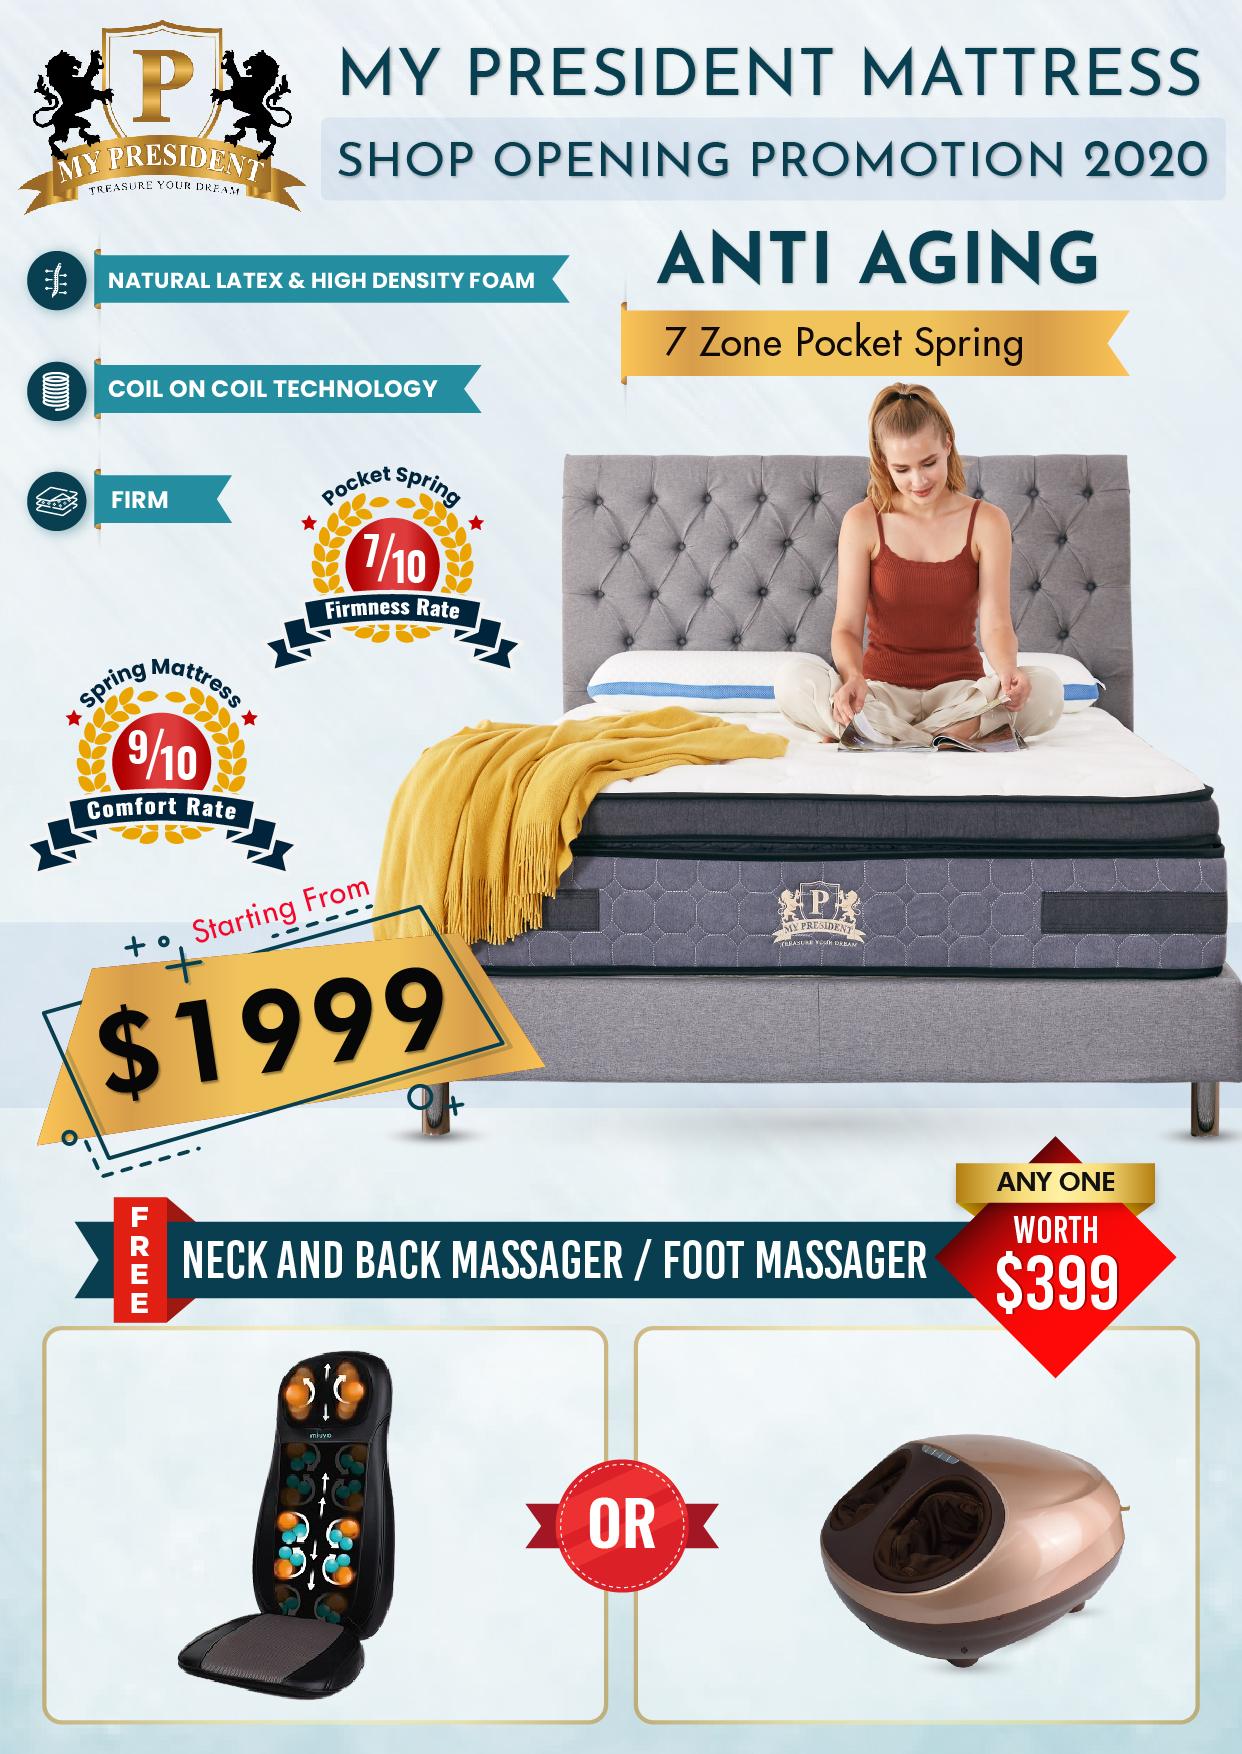 My President Mattress Anti Ageing Mattress